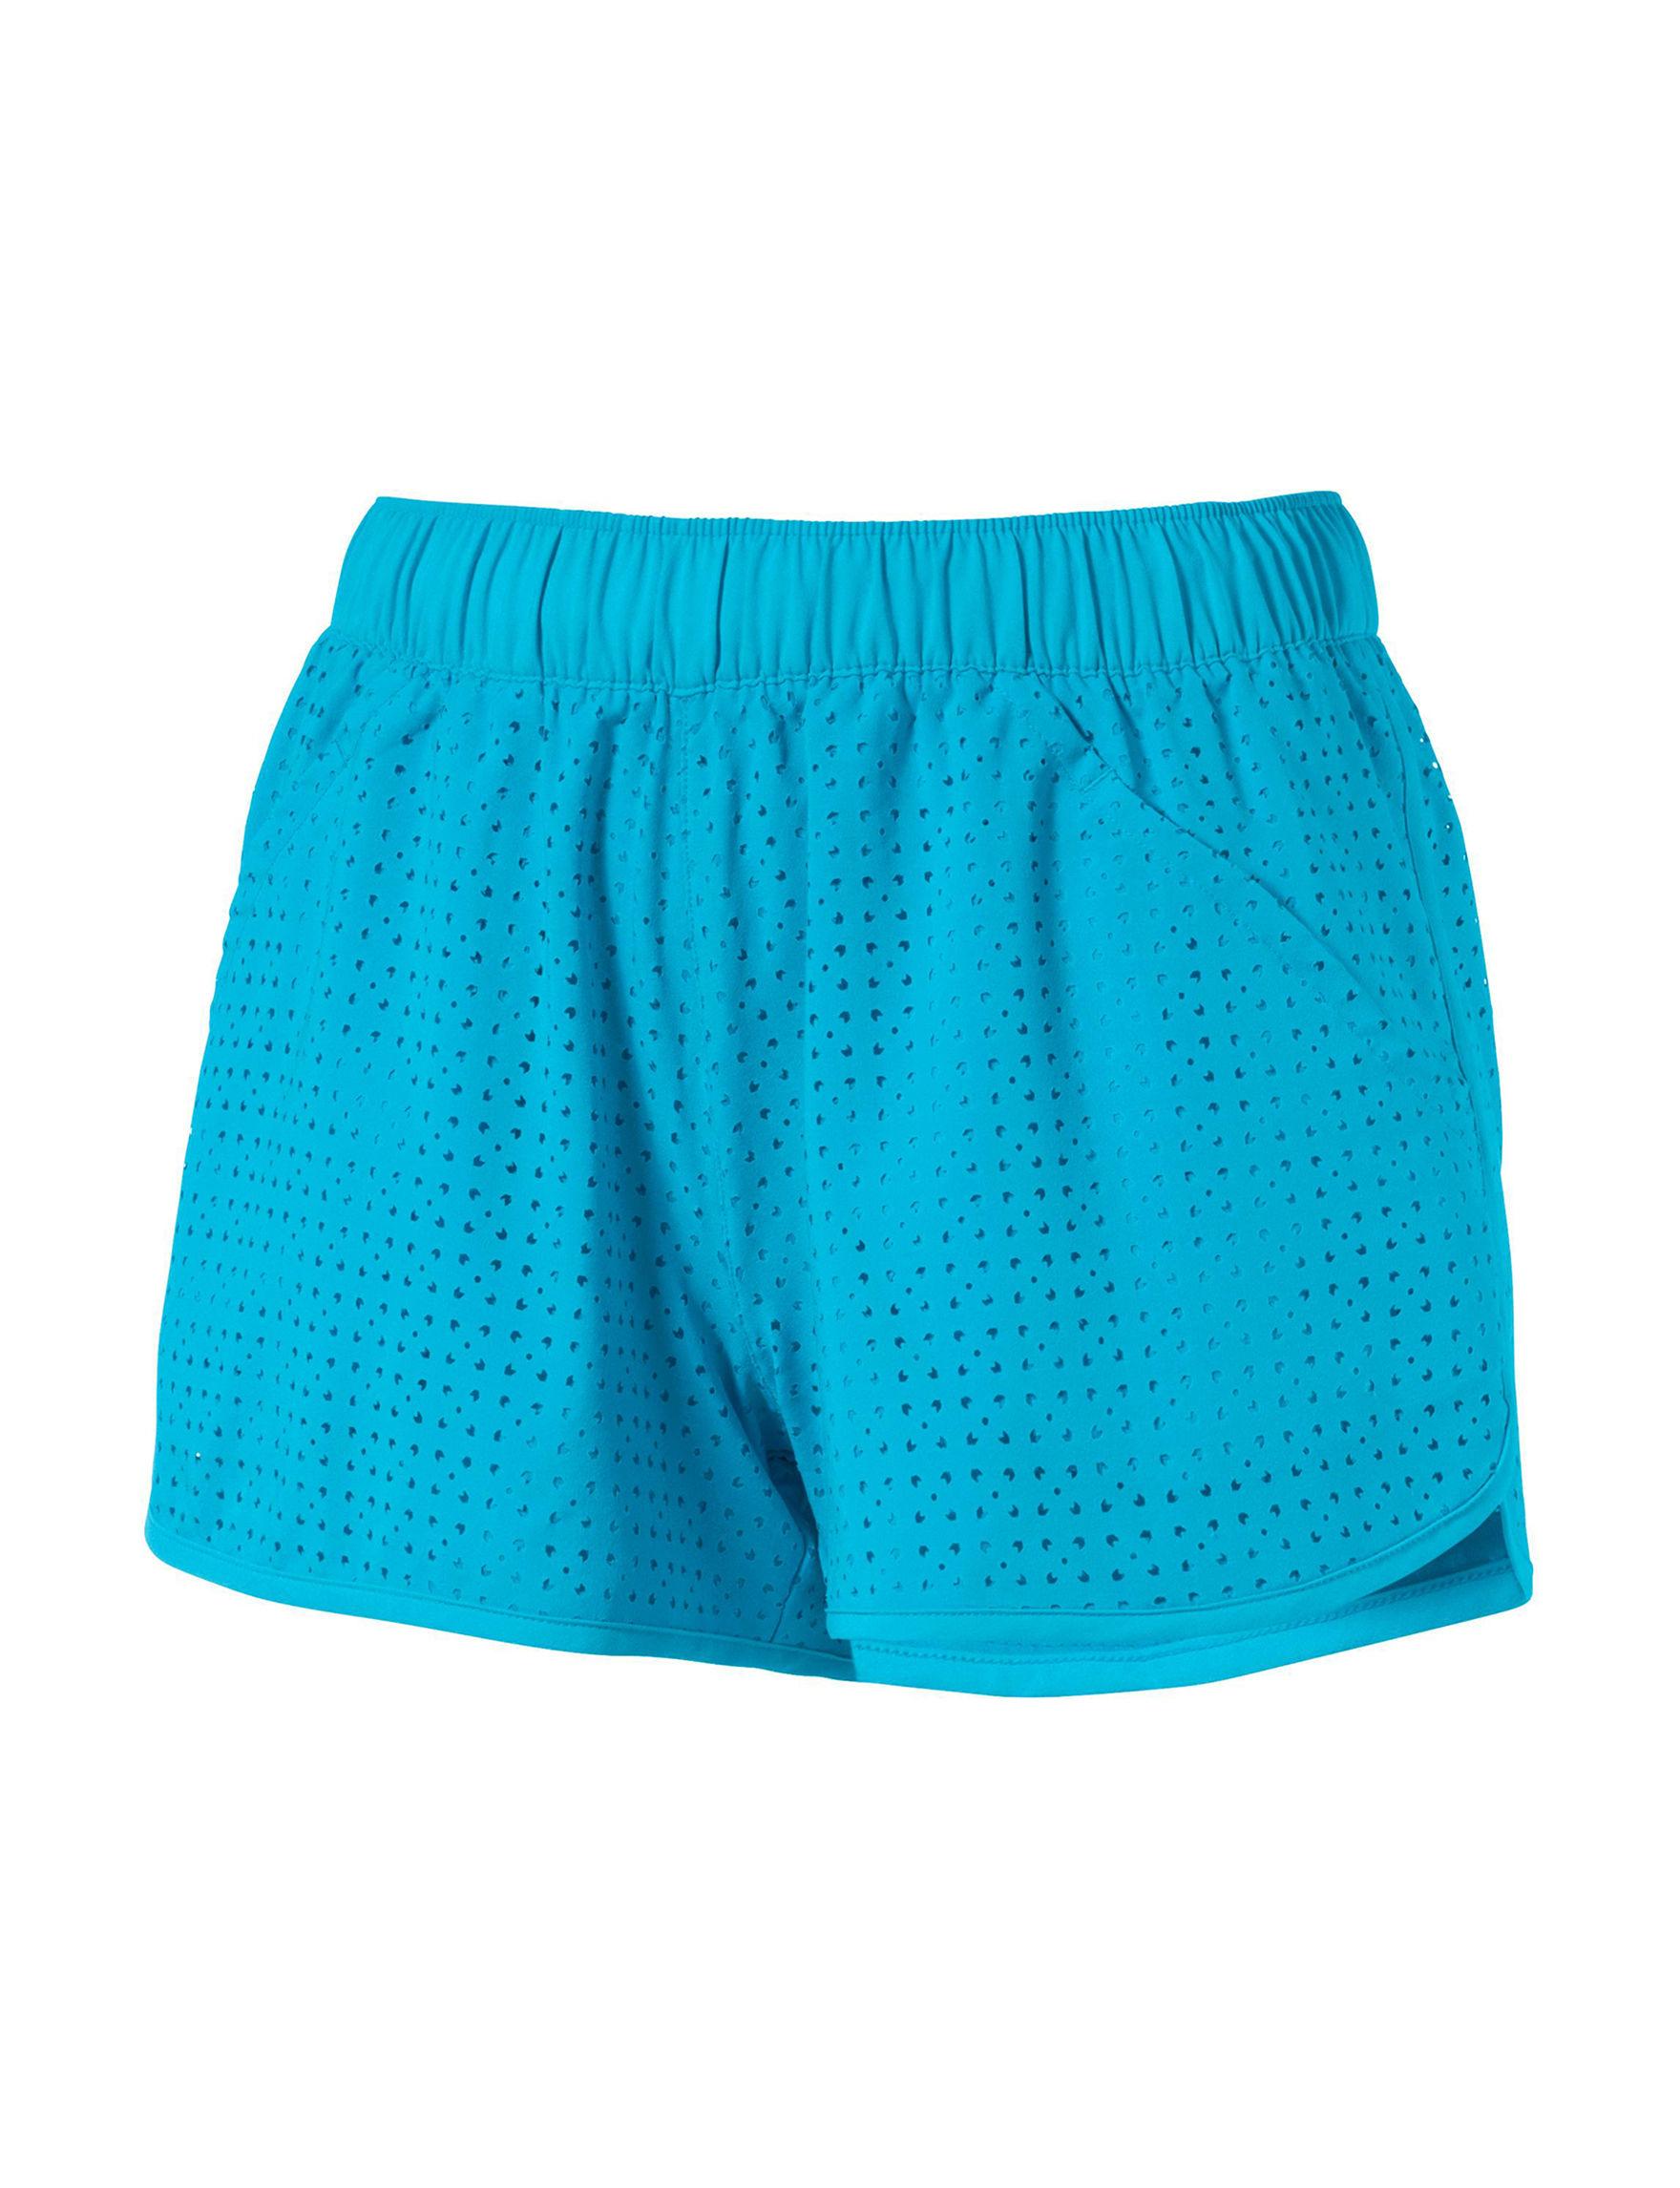 Puma Blue Soft Shorts